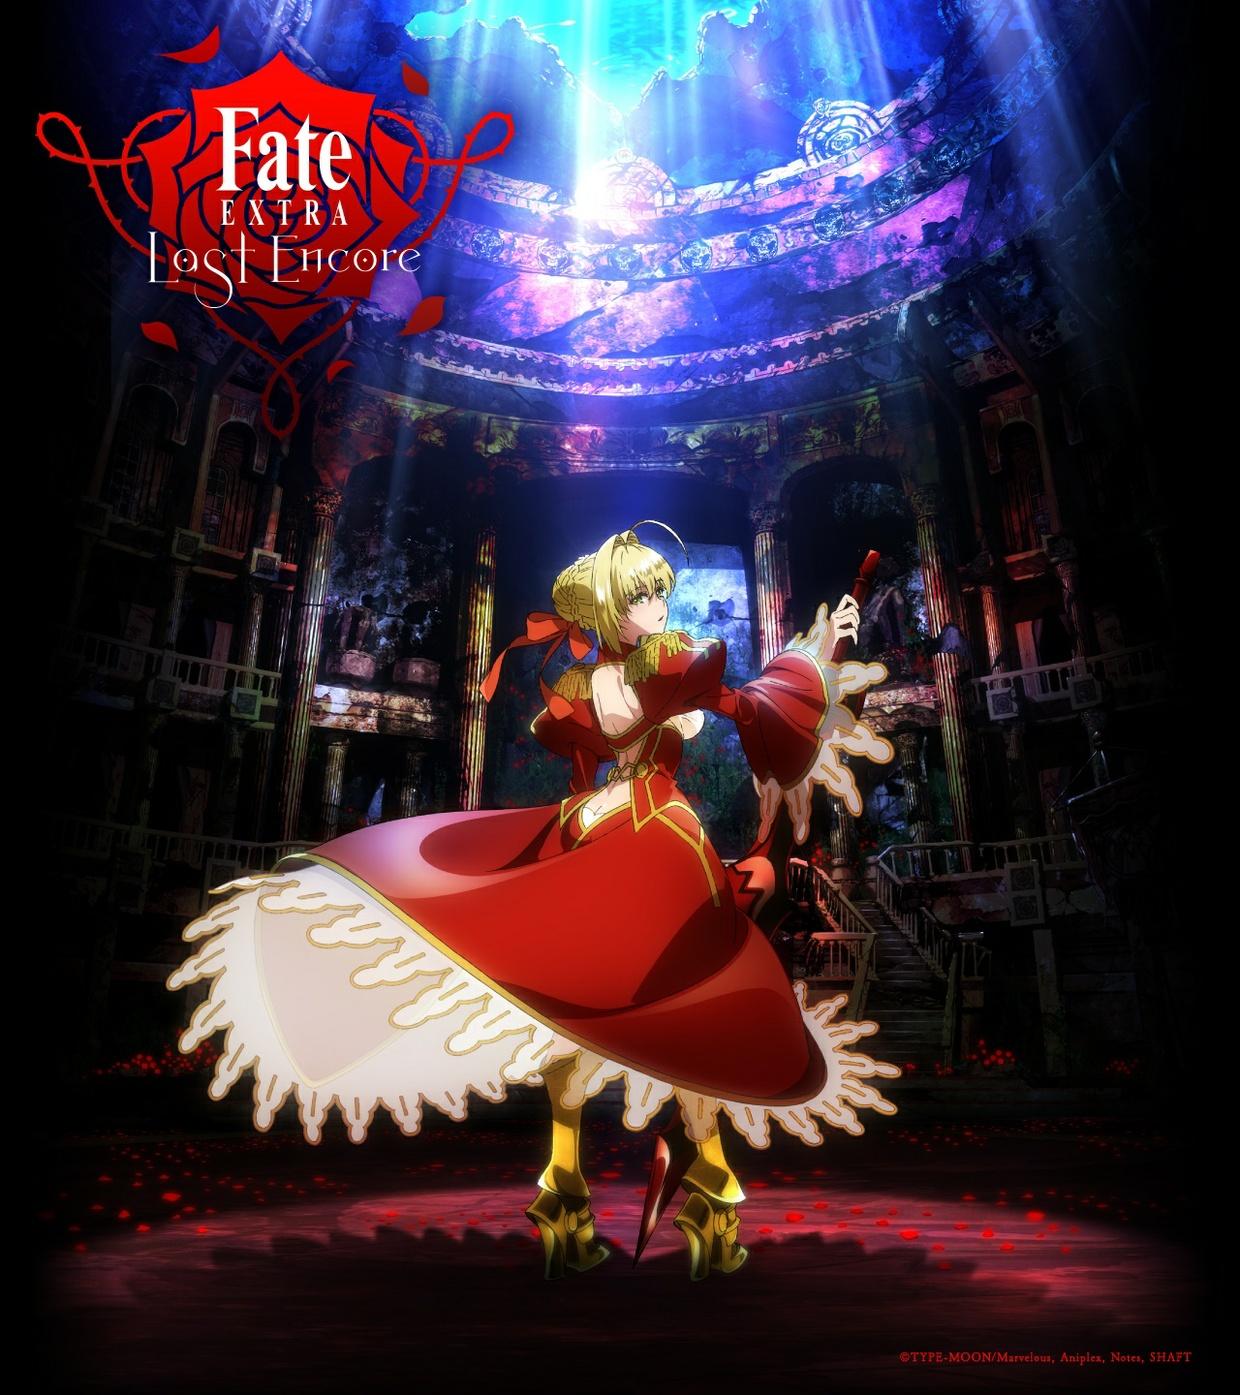 Fate/Extra Last Encore - Bright Burning Shout (Piano)